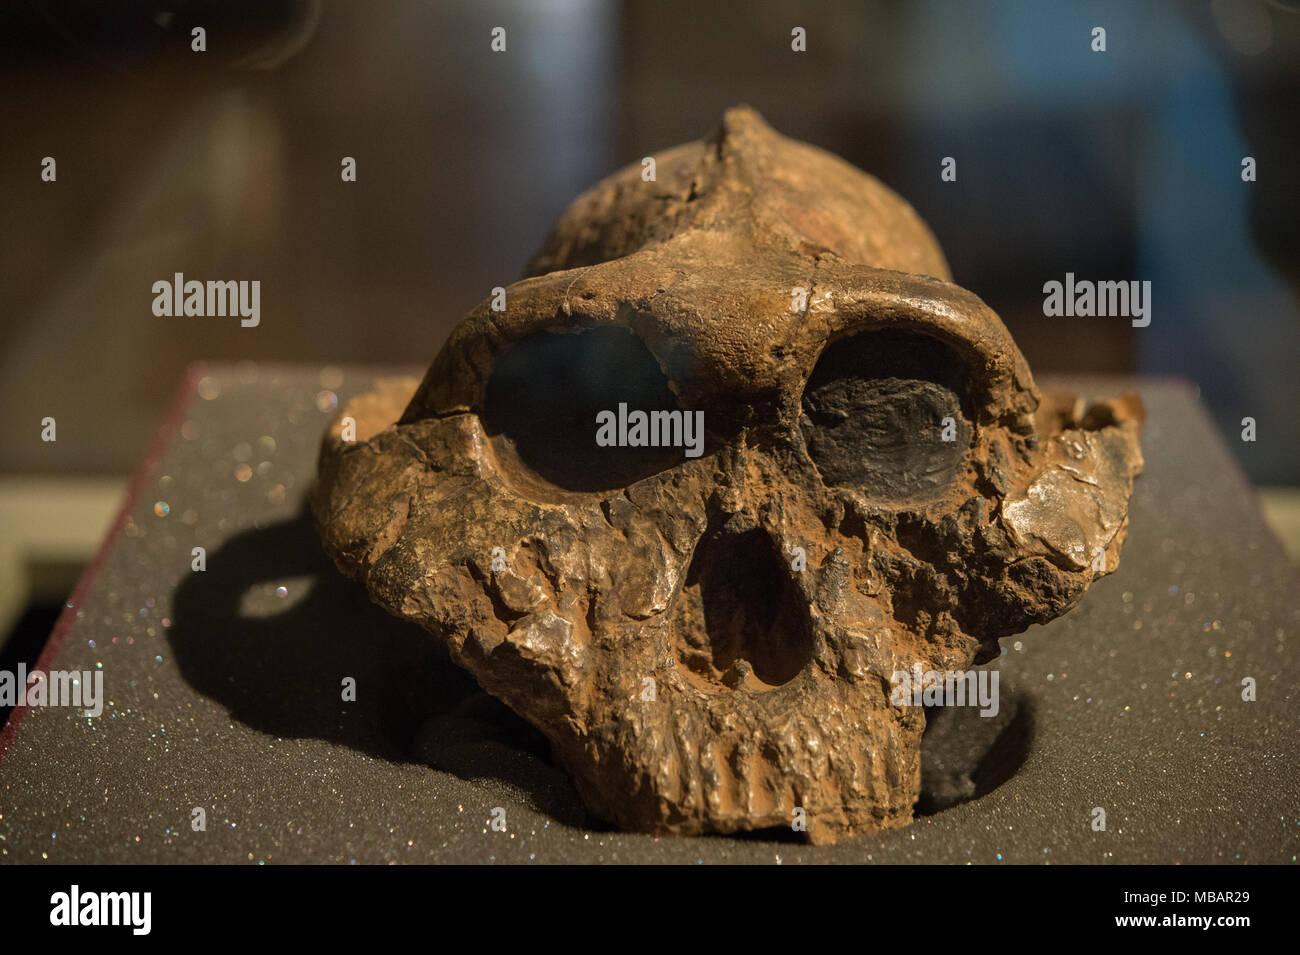 Skull of hominid, Paranthropus boisei, australopithecines. 2,6 - 1,2  million years old, East Africa. Pliocene and Pleistocene age. Nairobi Museum - Stock Image